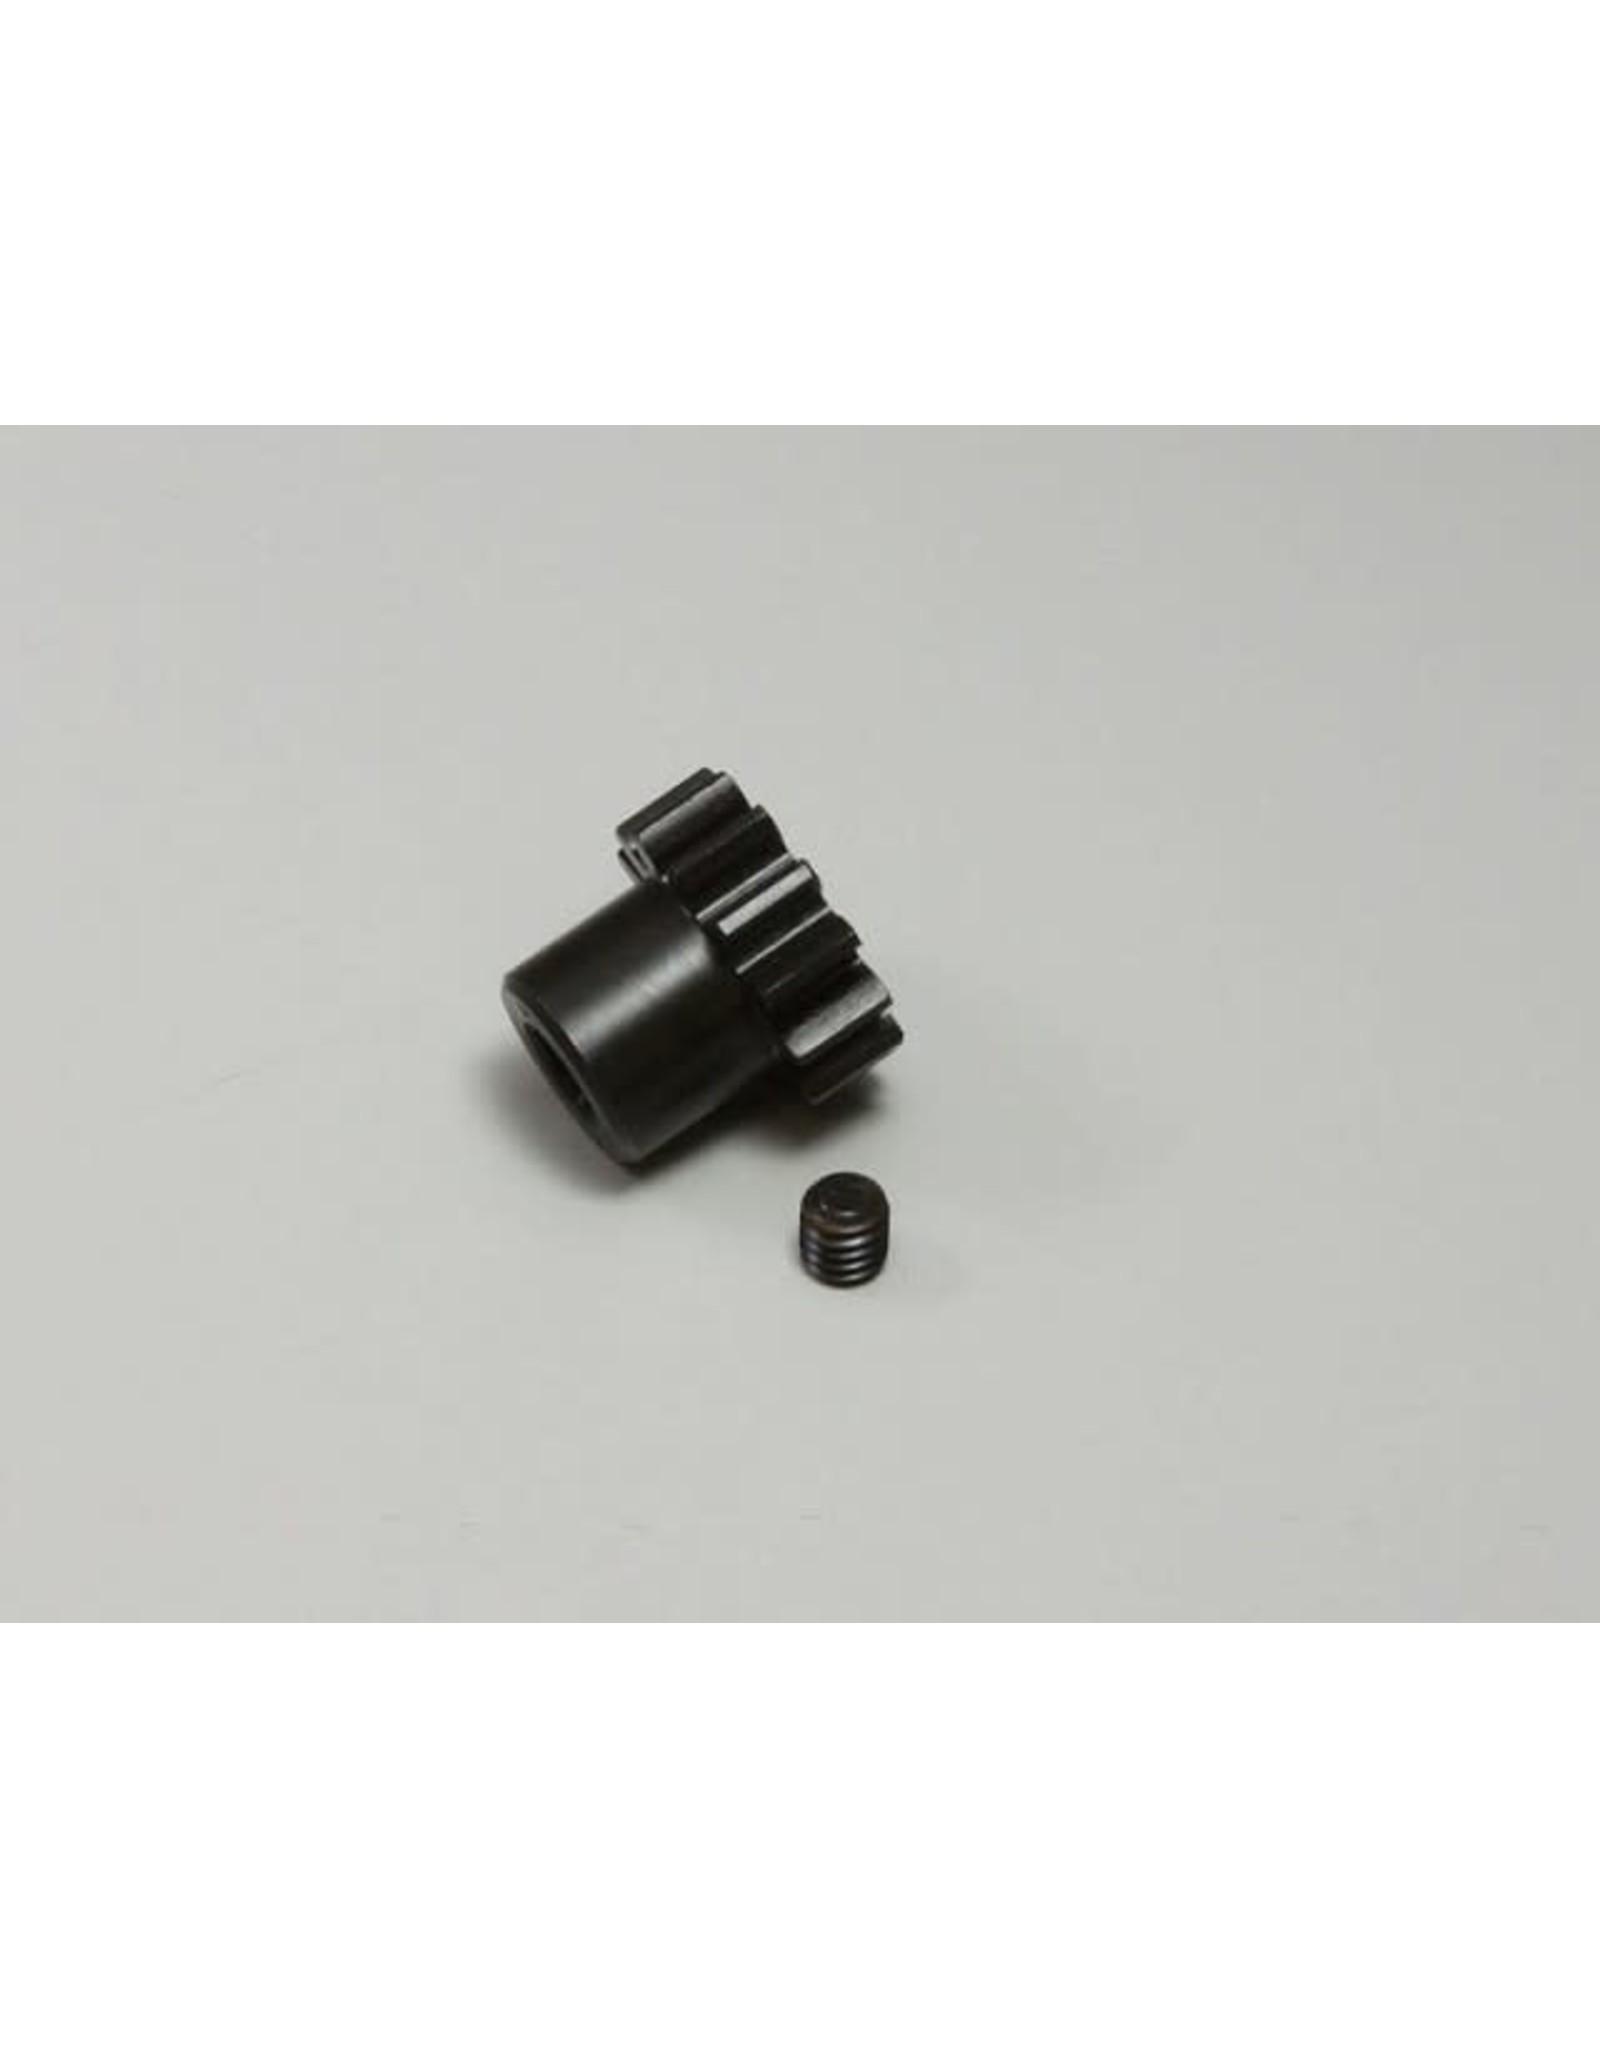 Kyosho Pinion Gear(13T/VE)